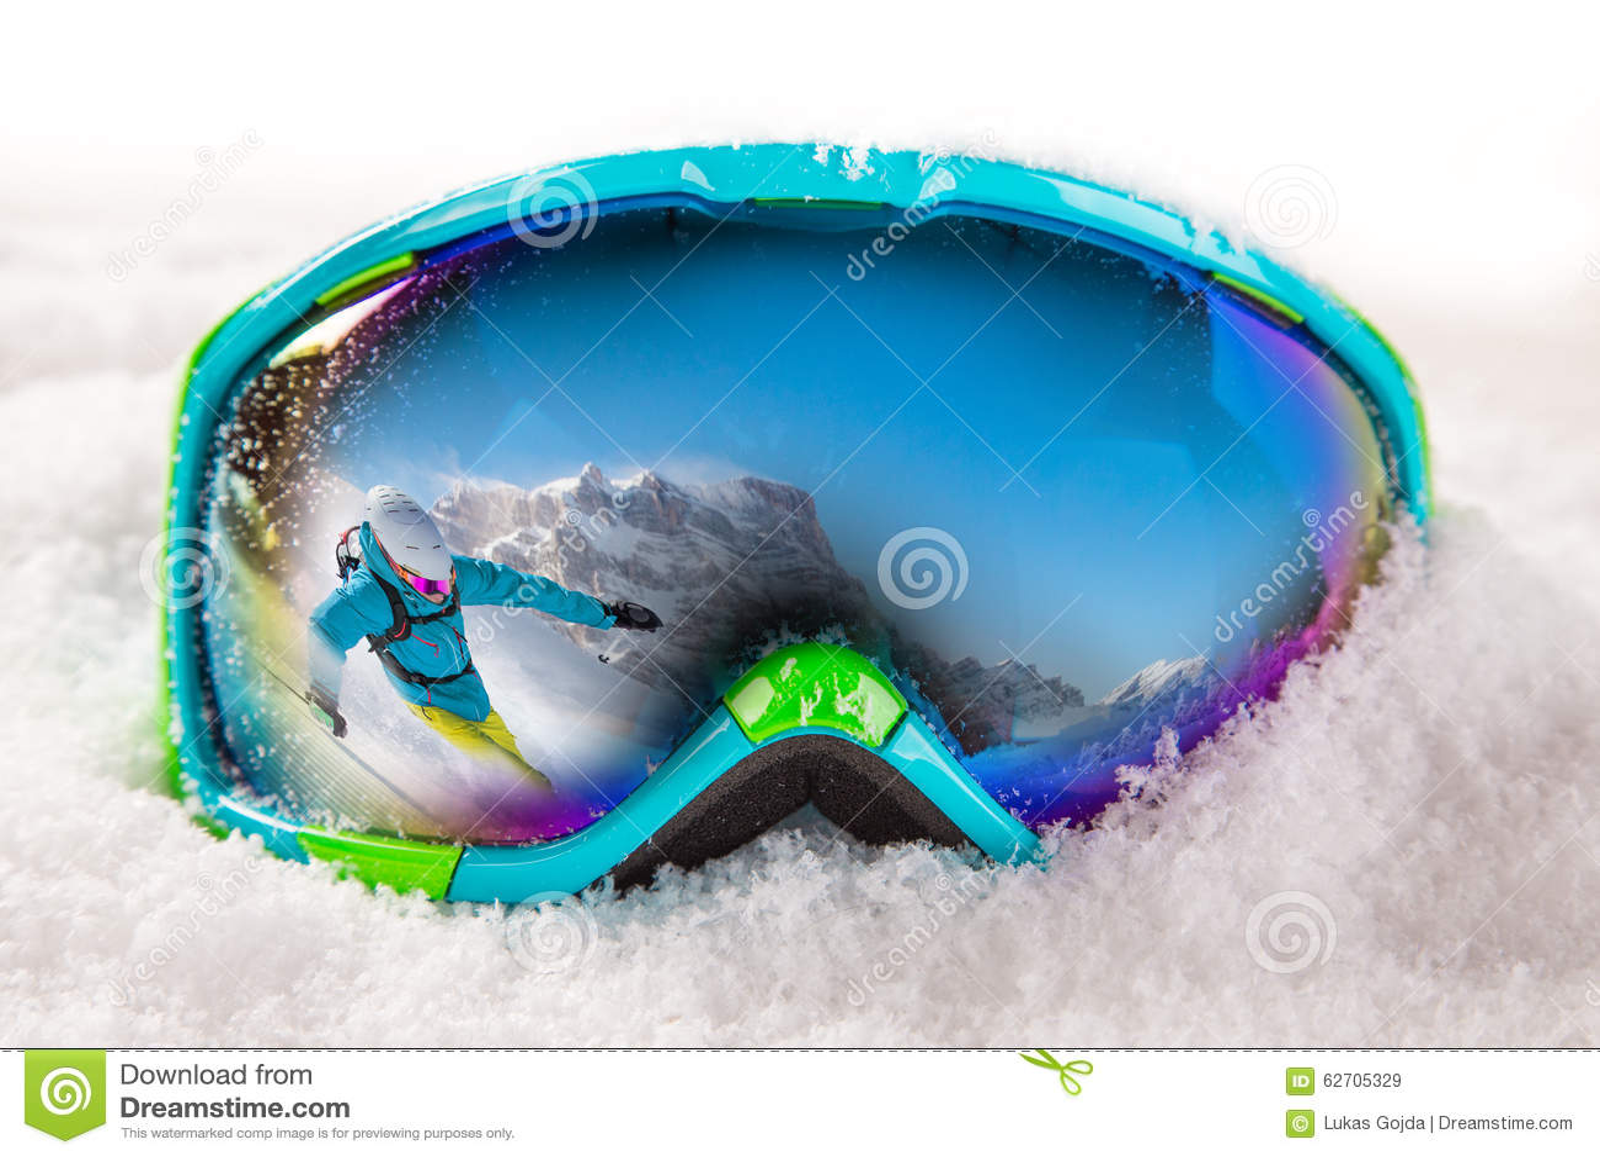 Download Ζωηρόχρωμα γυαλιά σκι στοκ εικόνα. εικόνα από αλπικό - 62705329